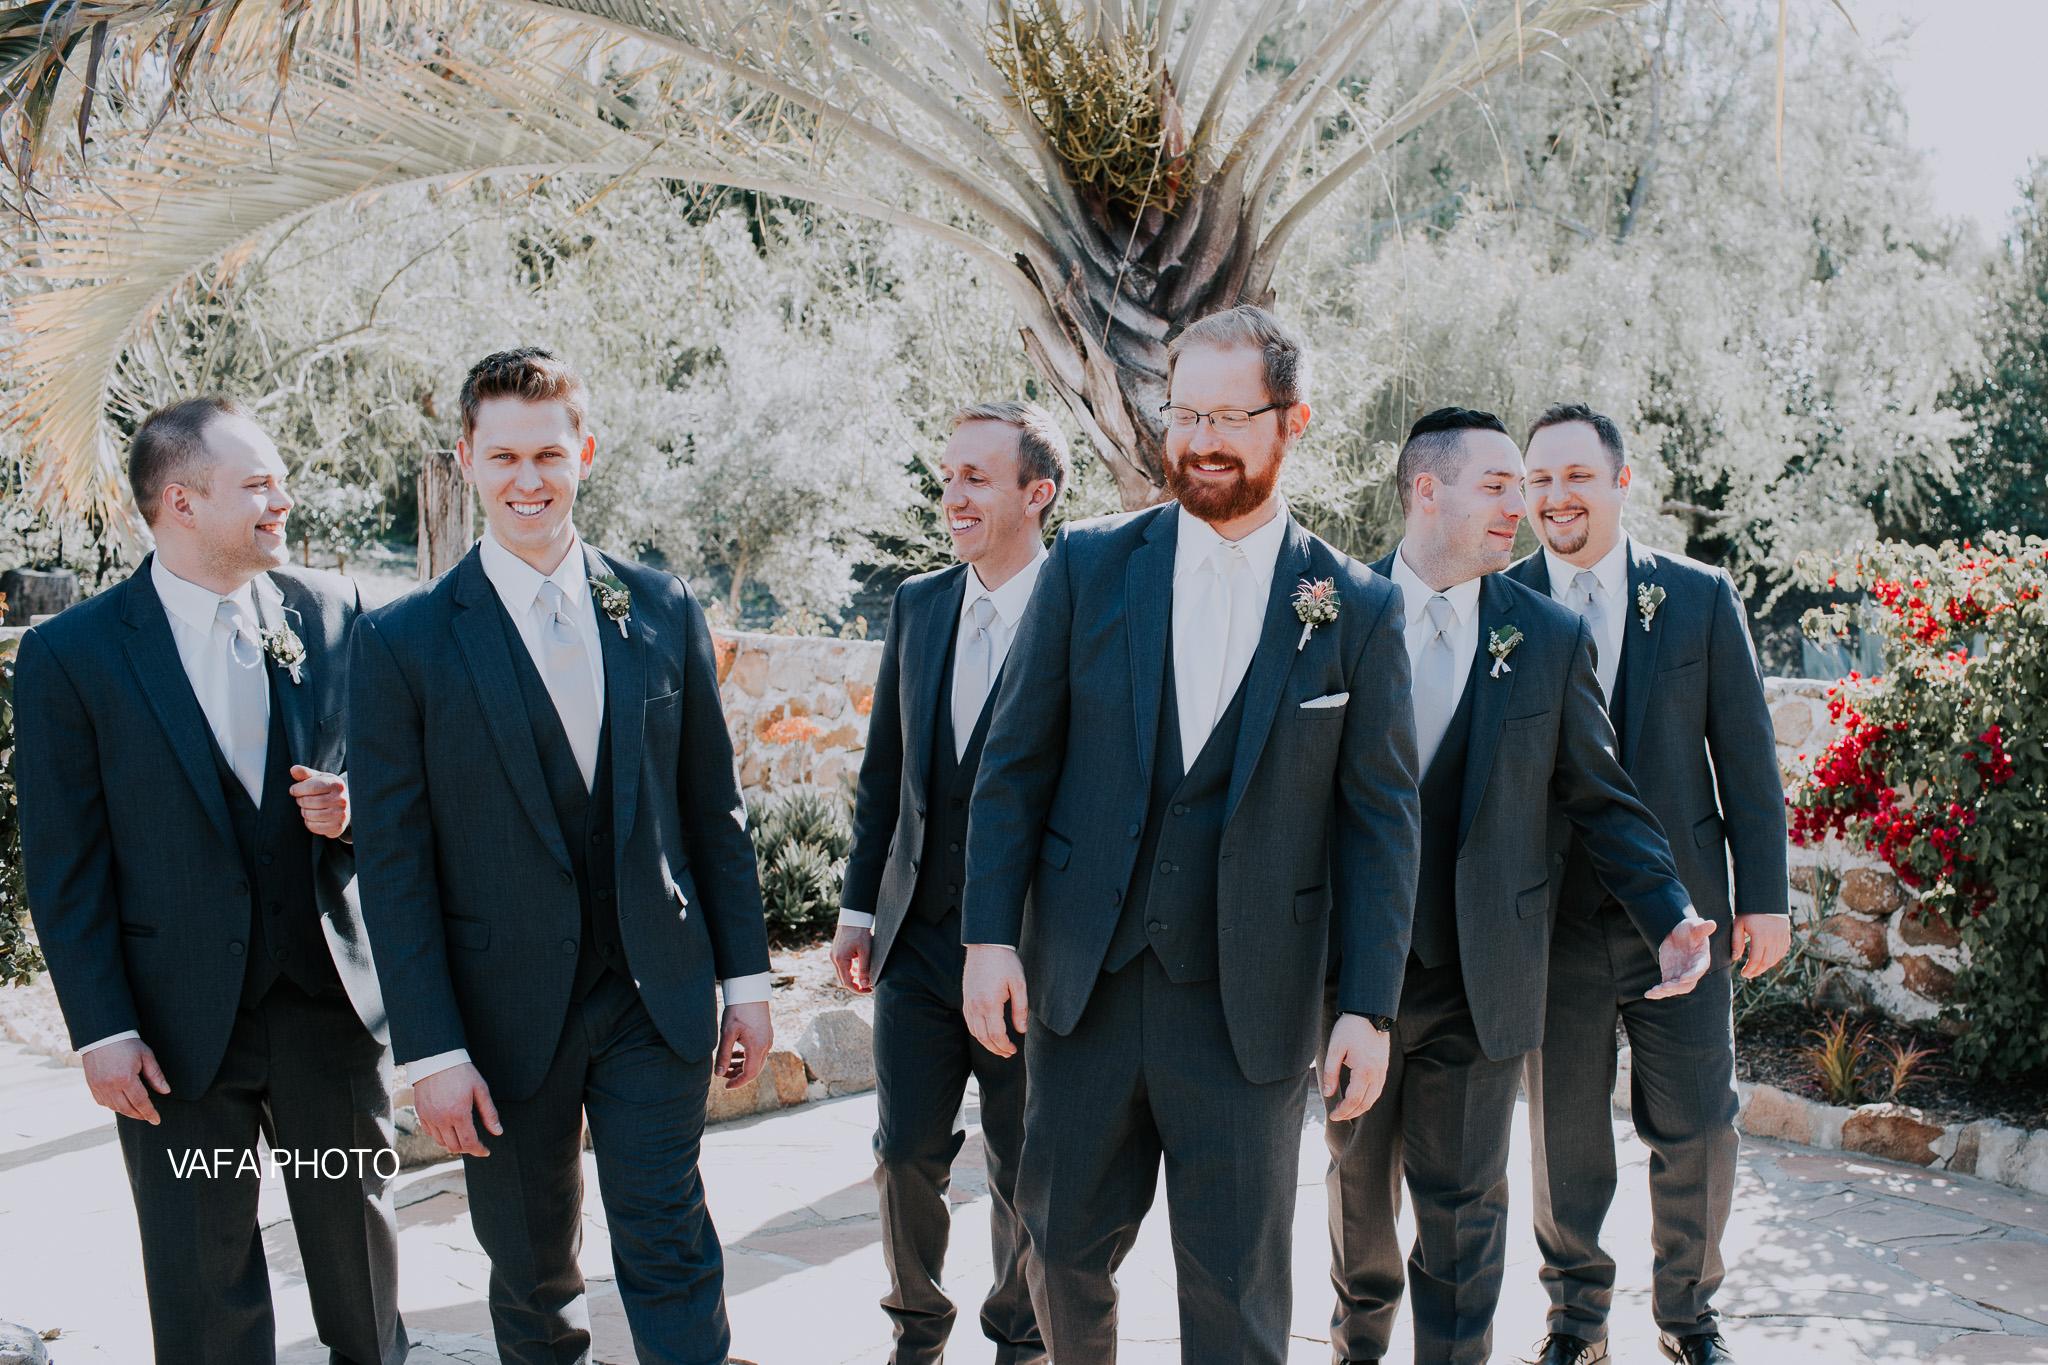 Leo-Carrillo-Ranch-Wedding-Lauren-Mike-Vafa-Photo-400.jpg